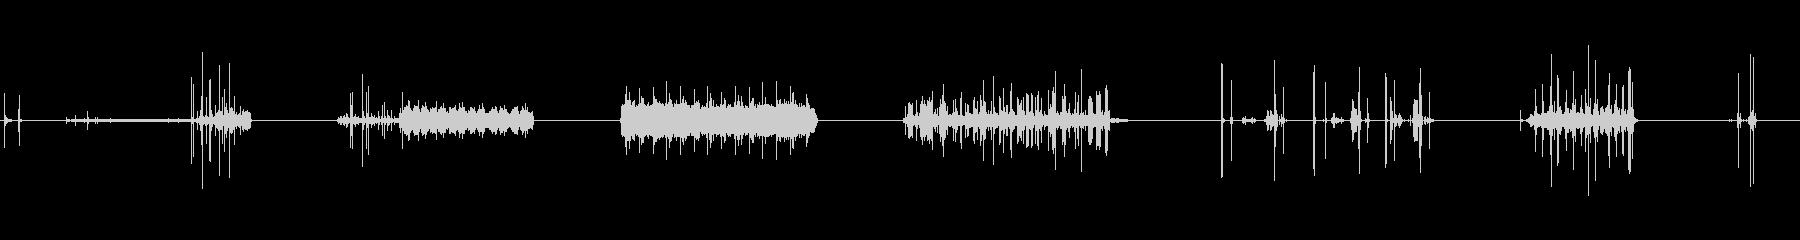 Victrolaキュー;シングルク...の未再生の波形